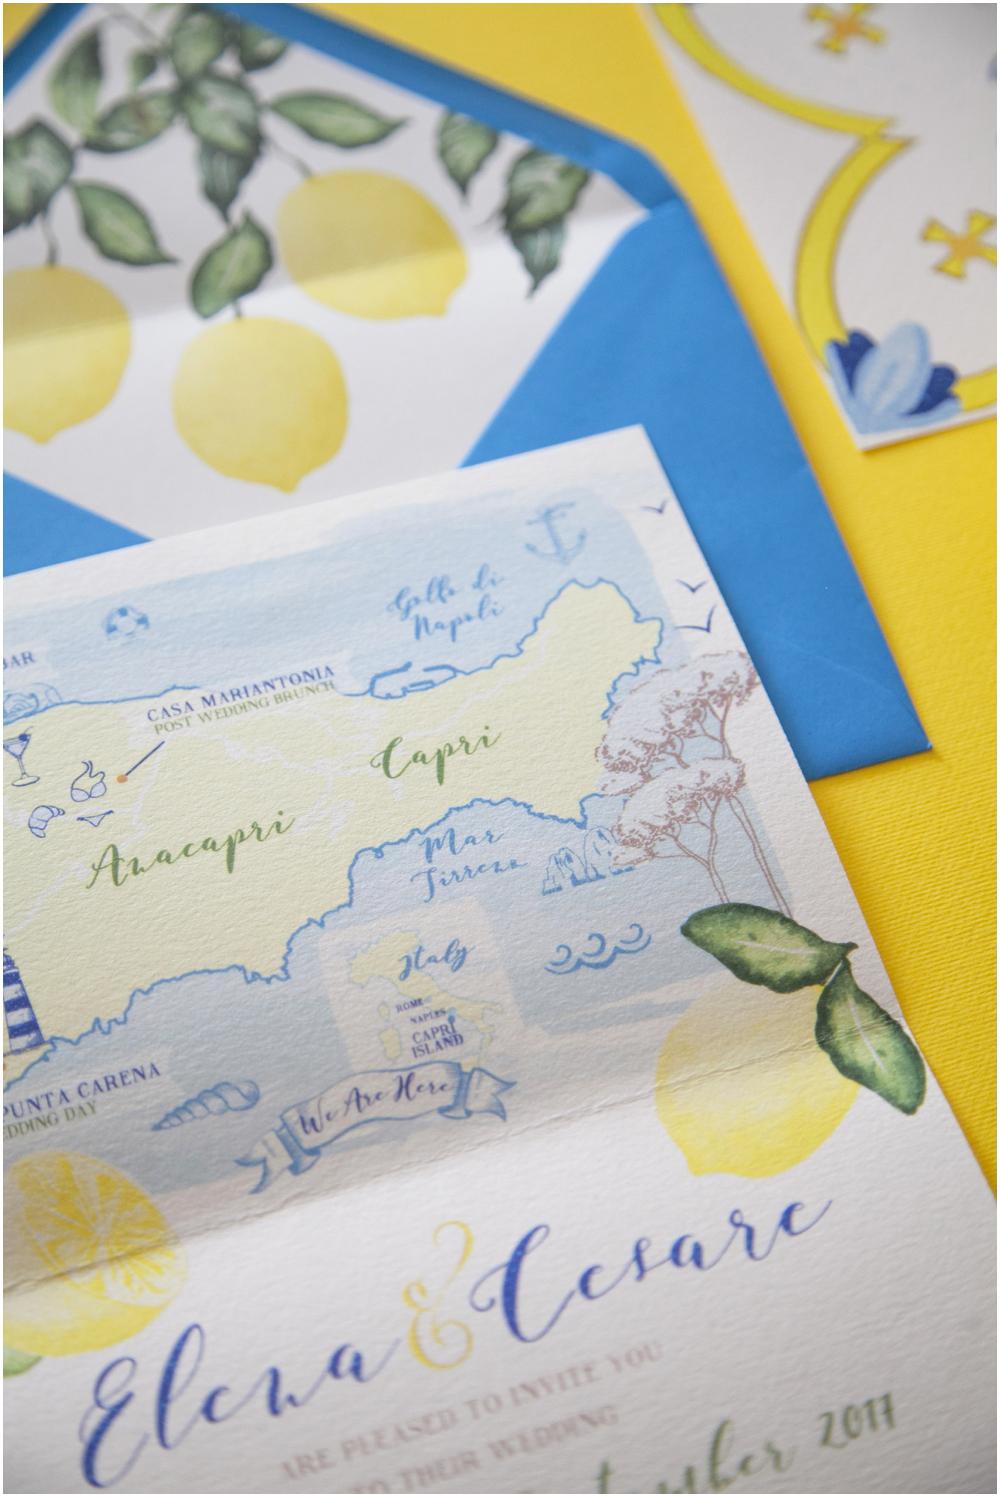 aucadesign_weddingstationery_capri_limoni_0015